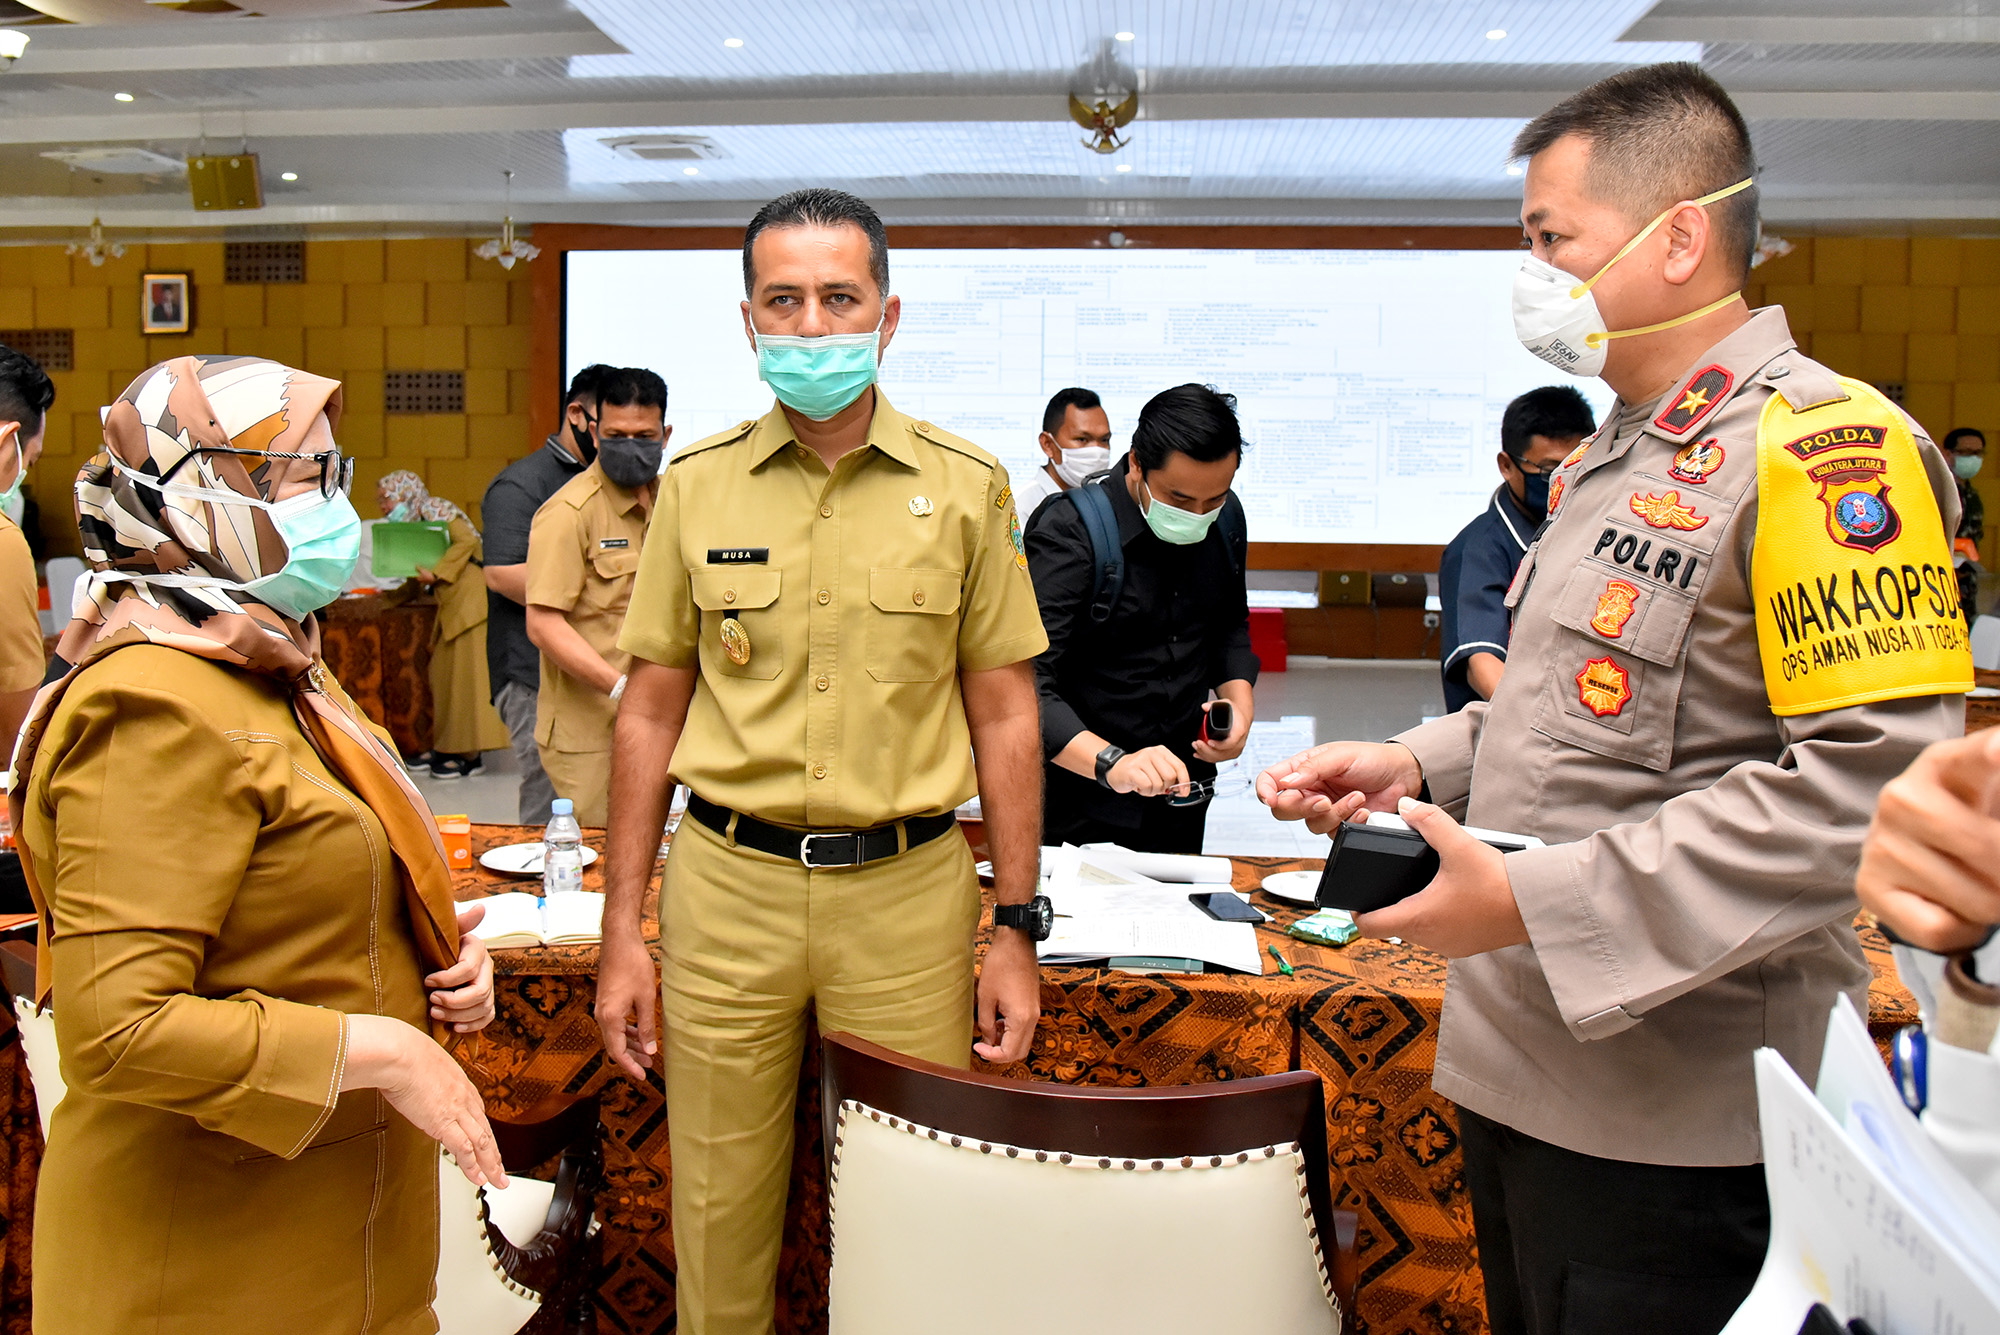 Wakil Gubernur Sumatera Utara, Musa Rajekshah didampingi Sekretaris Daerah, R Sabrina memimpin rapat koordinasi Gugus Tugas Percepatan Penanganan Covid-19 Sumut. Foto: Biro Humas dan Keprotokolan Setdaprov Sumut/ Veri Ardian